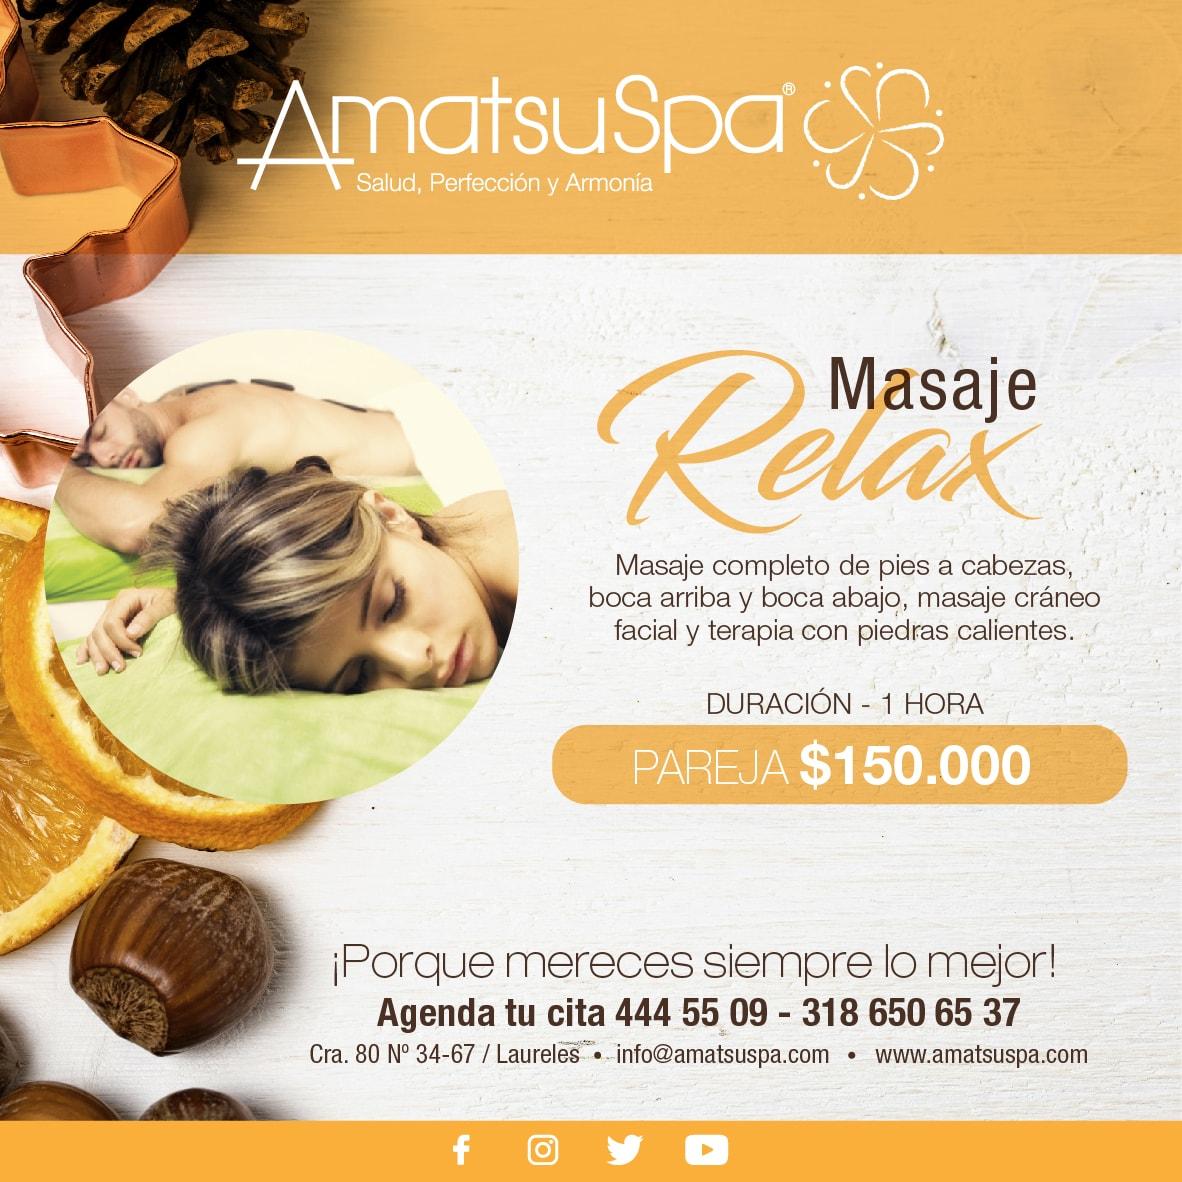 Spa Medellín - Masajes Medellín - Tratamientos faciales Medellín